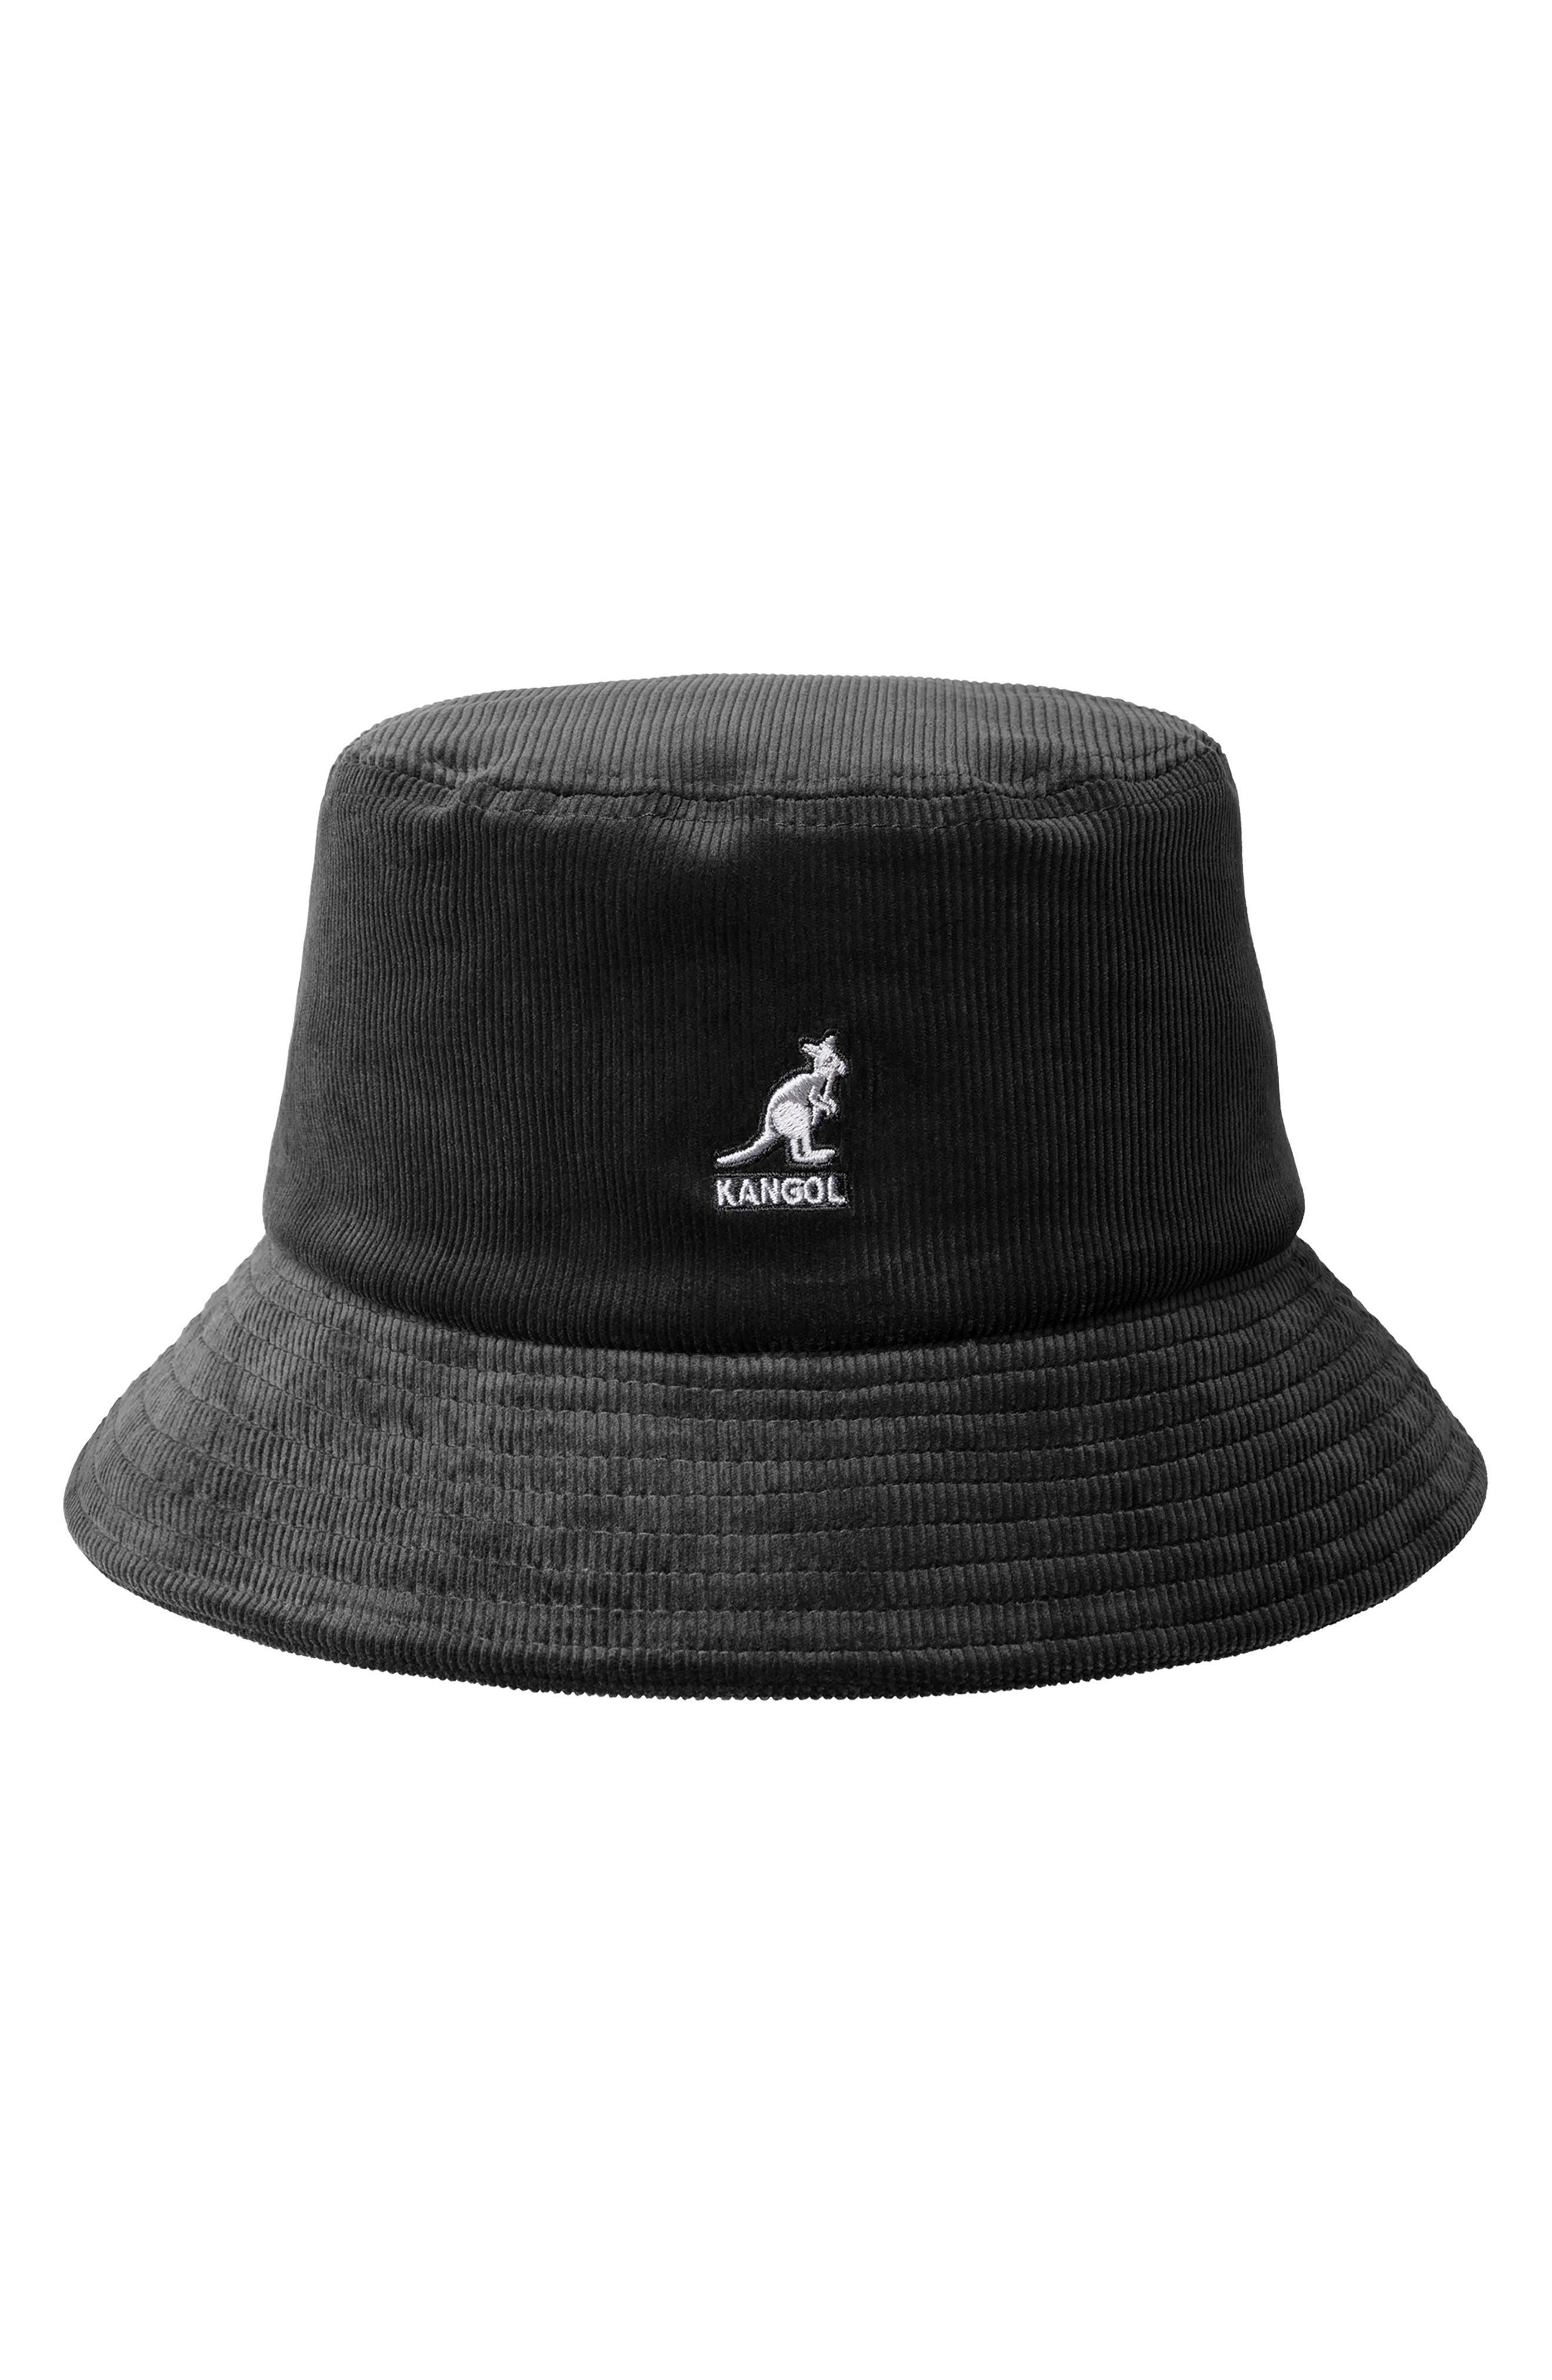 KANGOL Corduroy Bucket Hat - Black